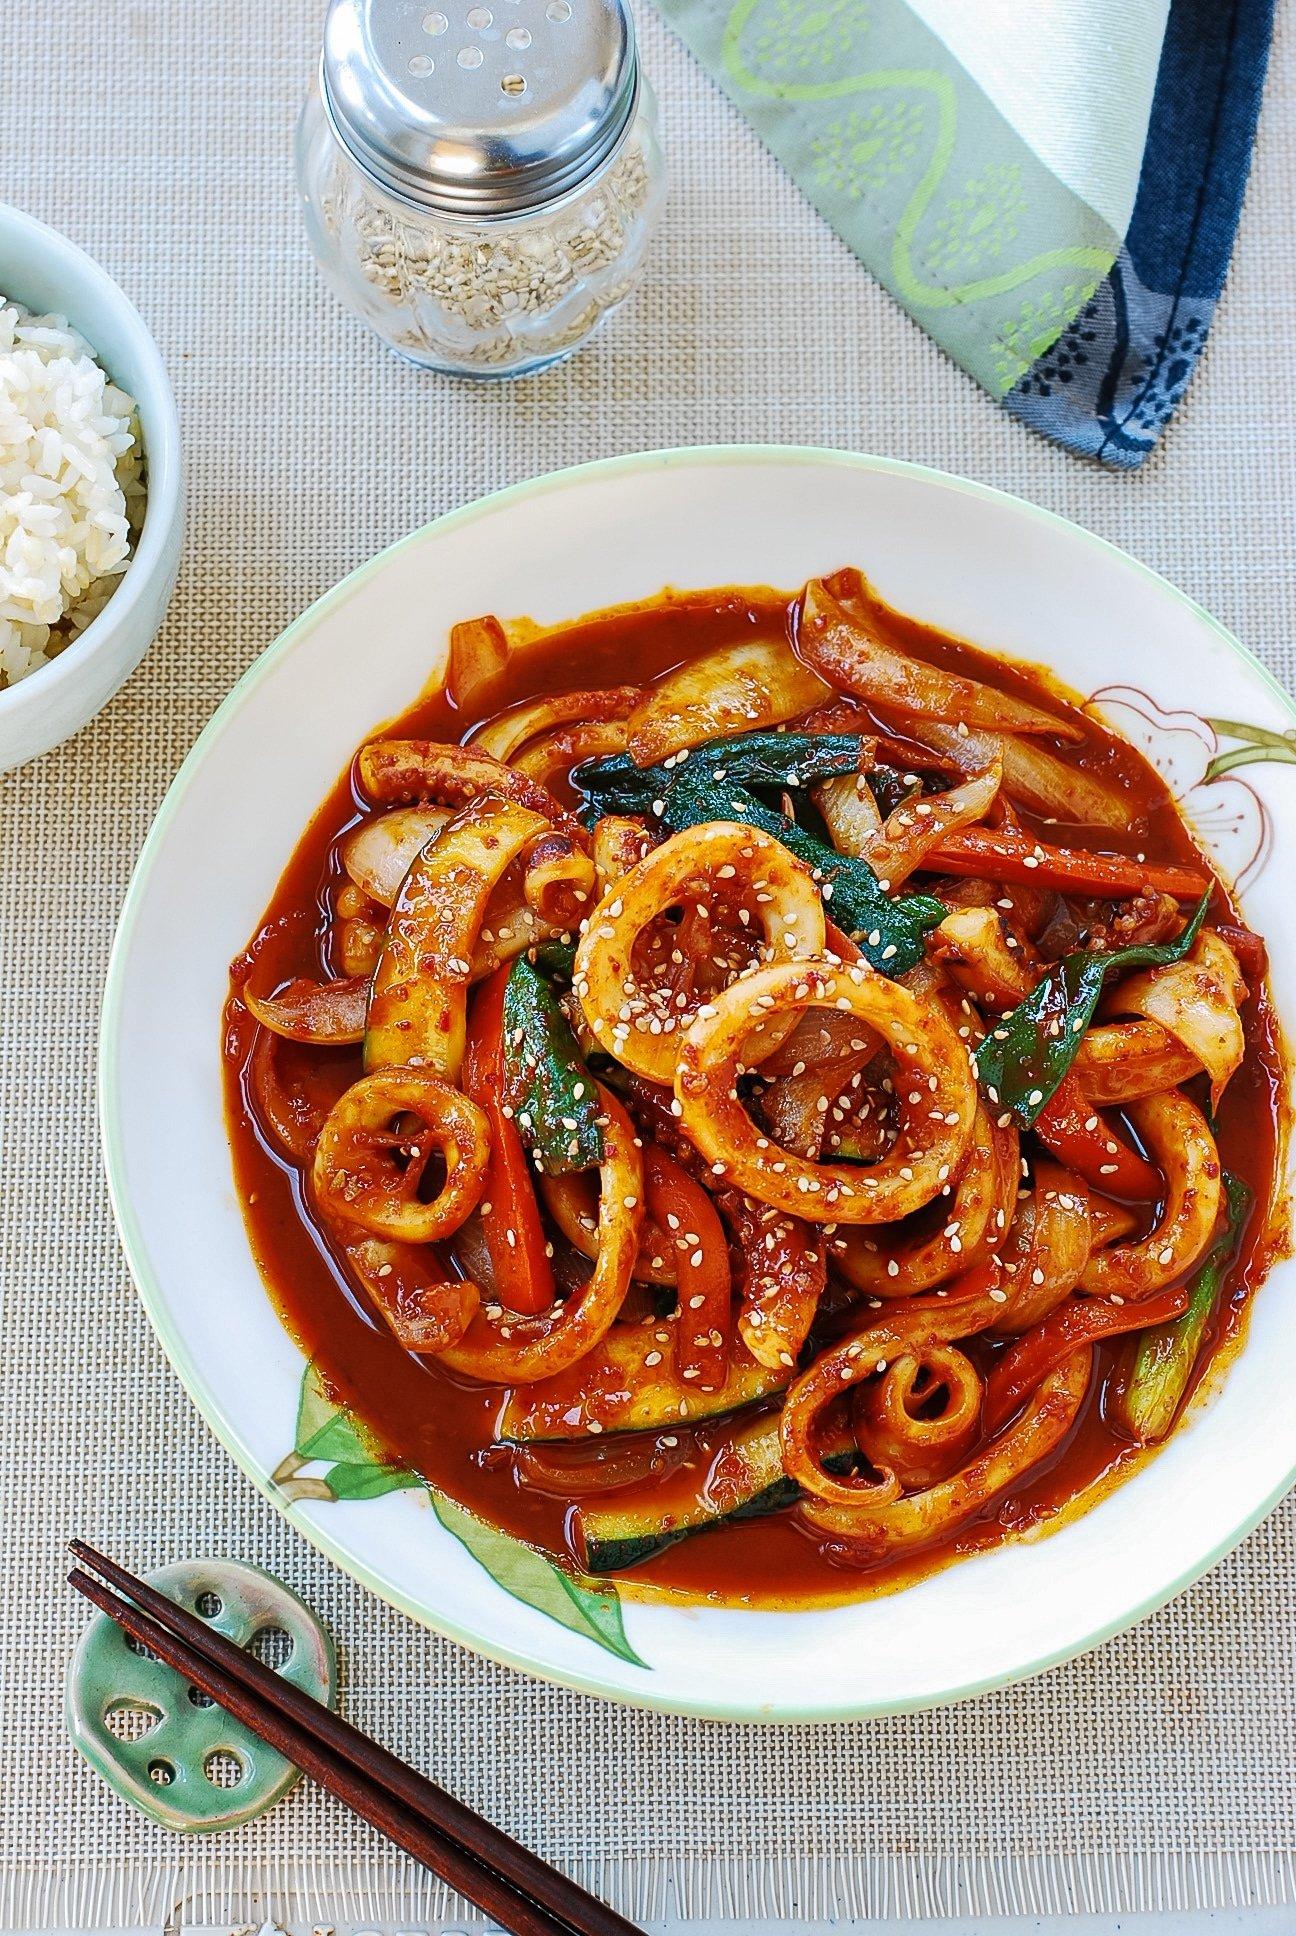 DSC 0024 - Ojingeo Bokkeum (Korean Spicy Stir-fried Squid)